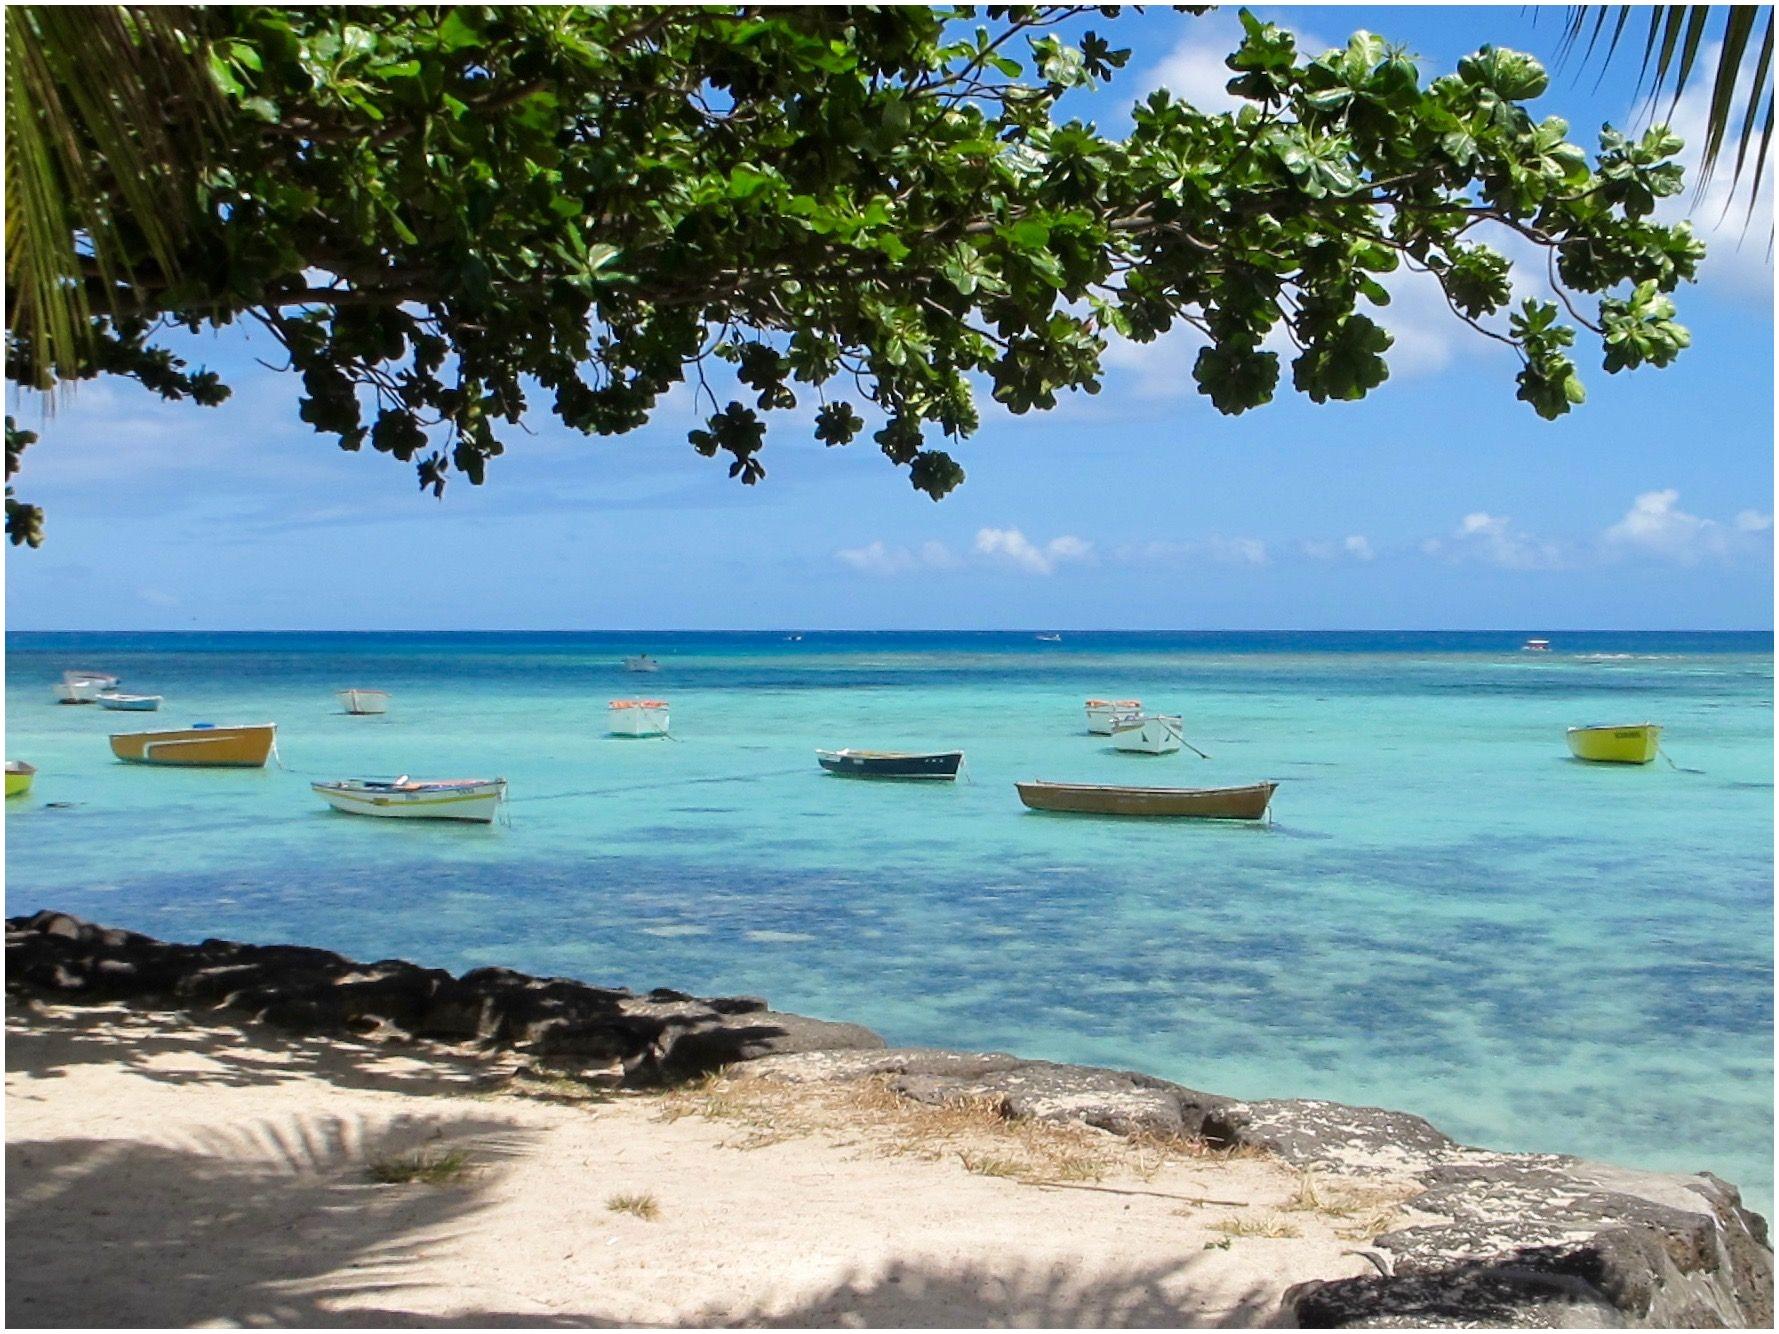 Likoma Island Beach – Malawi